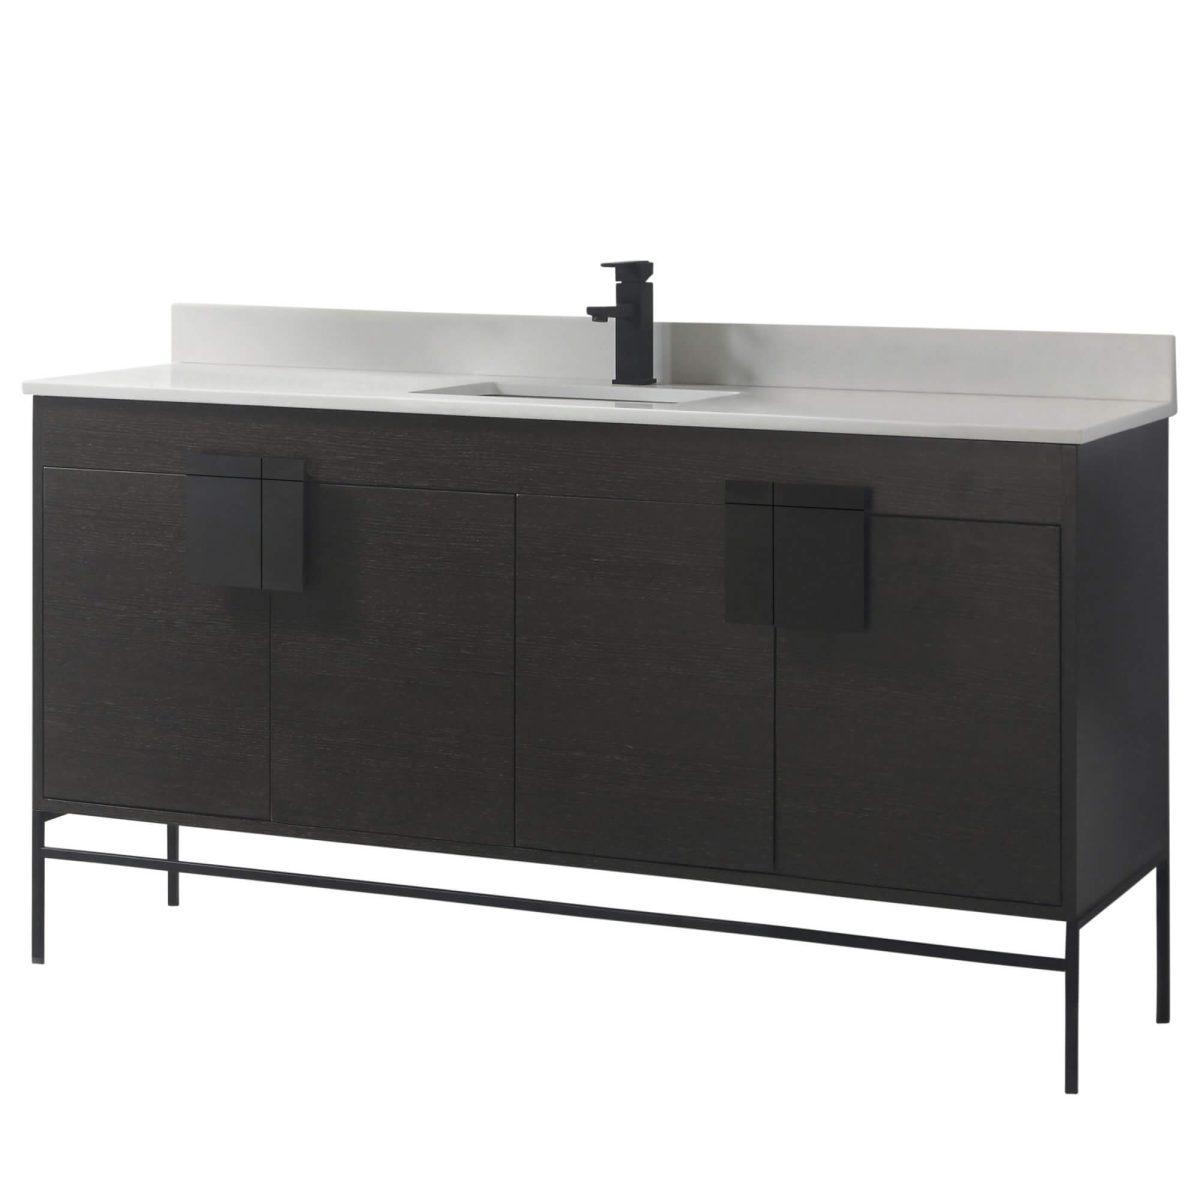 "Shawbridge 60"" Modern Single Bathroom Vanity  Black Oak Straight Grain with Black Hardware"